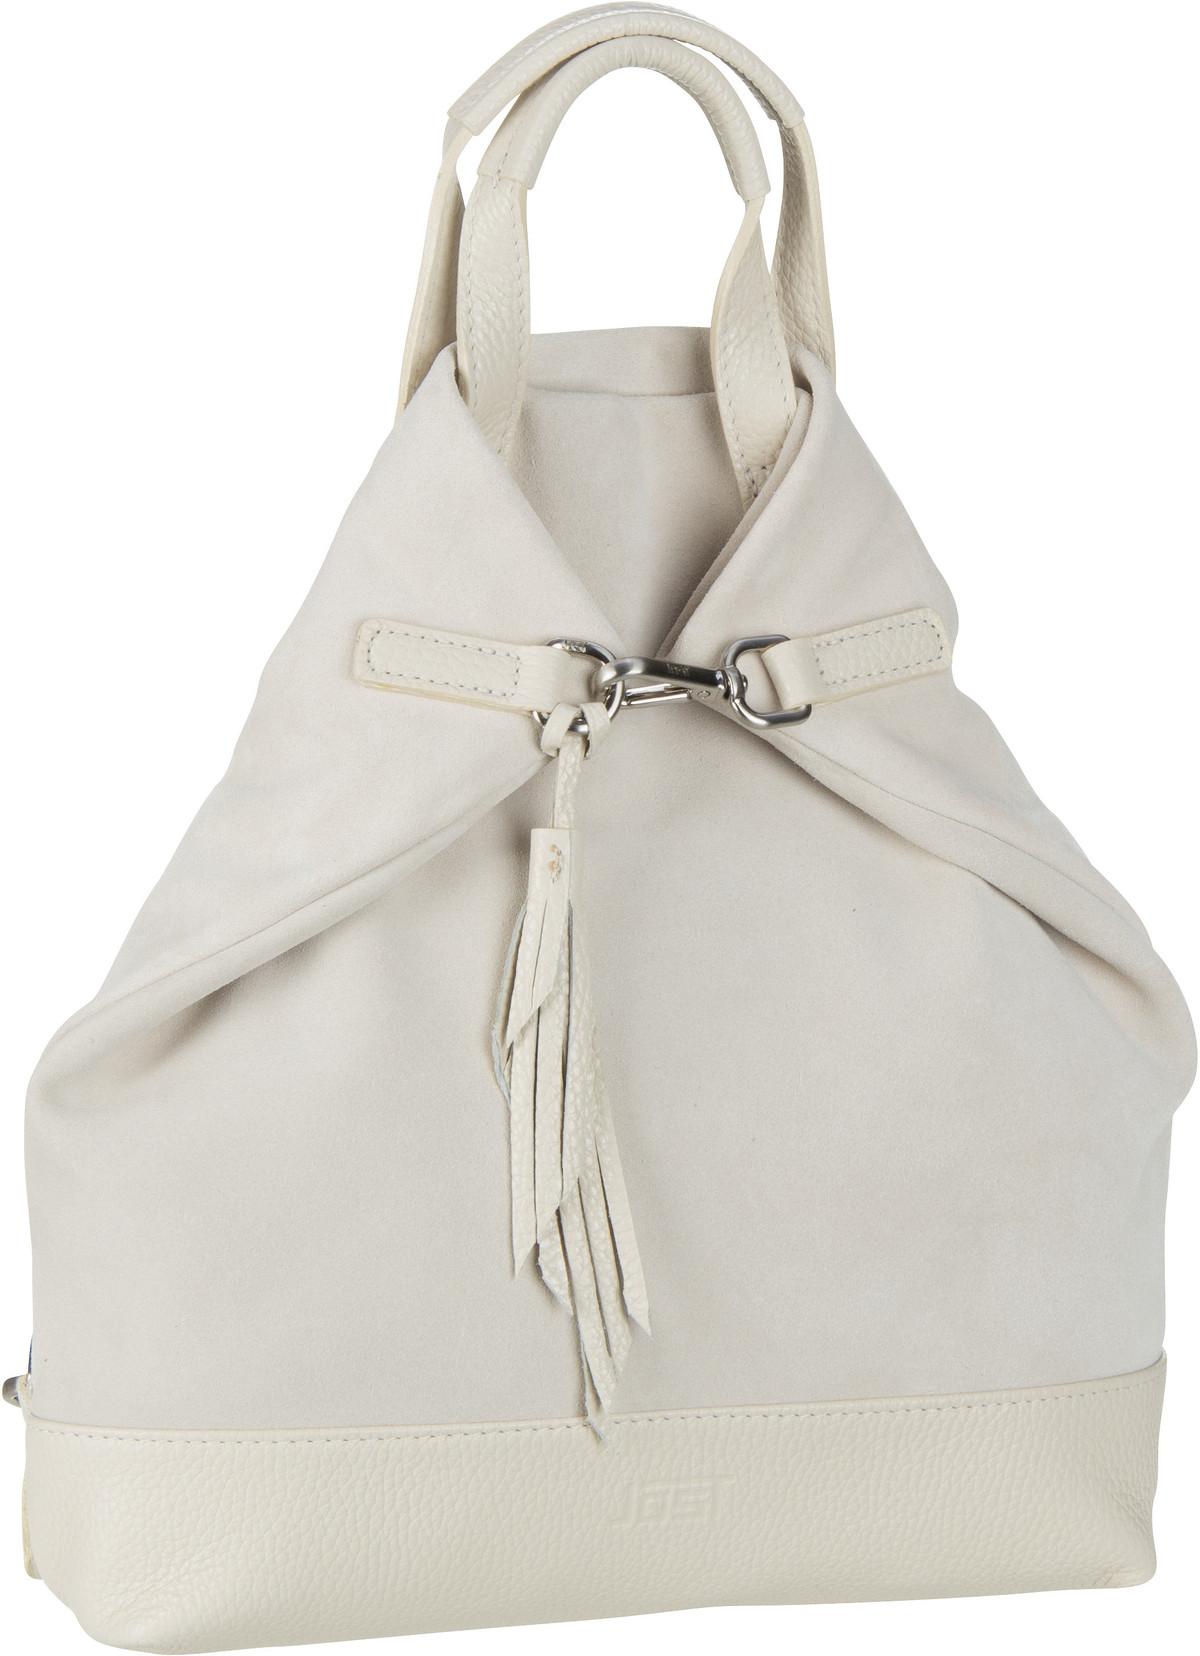 Rucksack / Daypack Motala 1729 X-Change Bag XS Offwhite